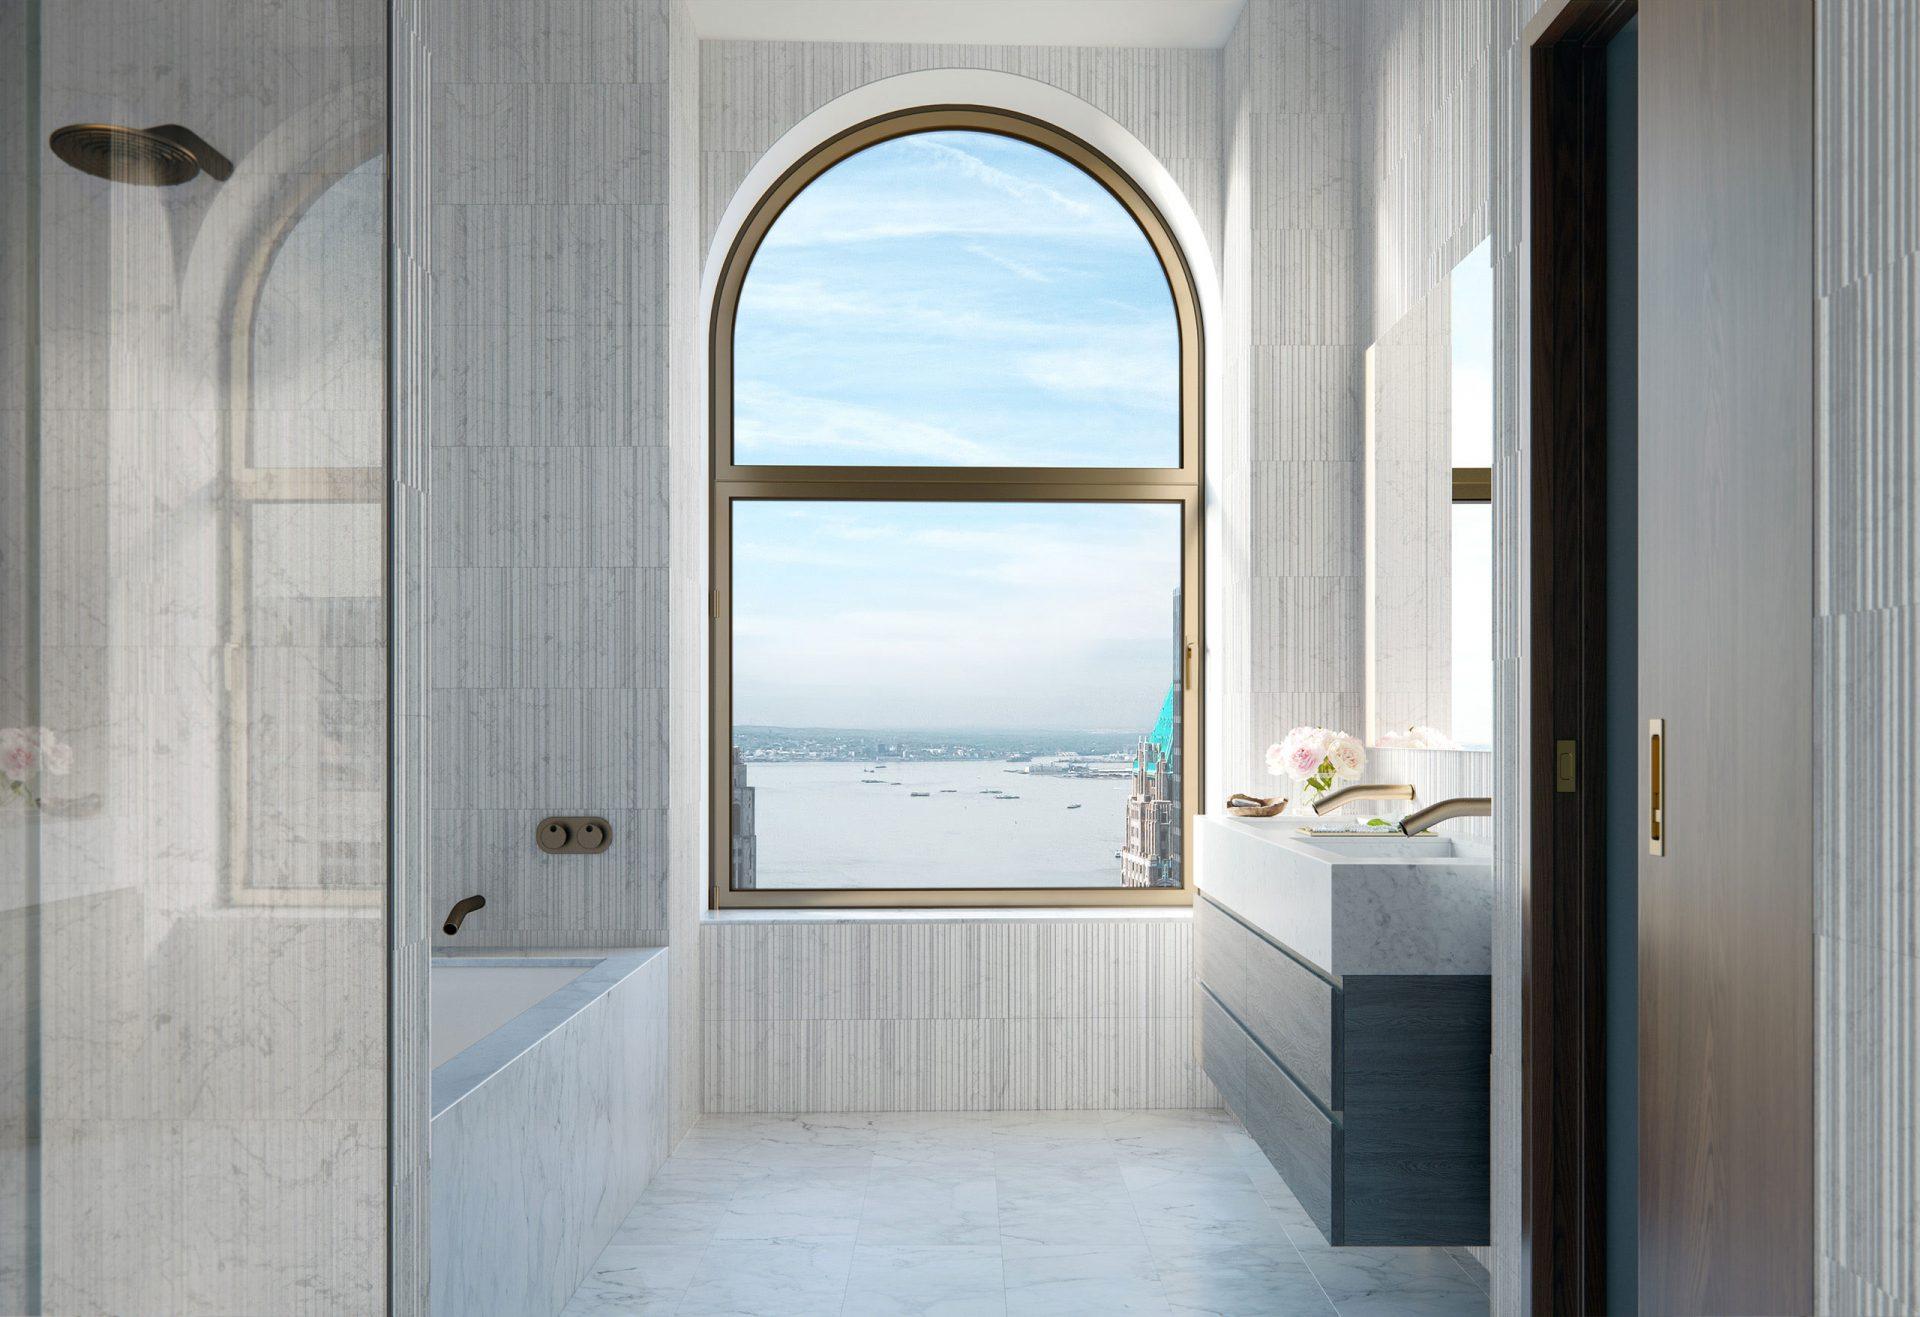 130William_03_Residences_04_INT_Master_Bathroom_2560pxl-1920x1317.jpg